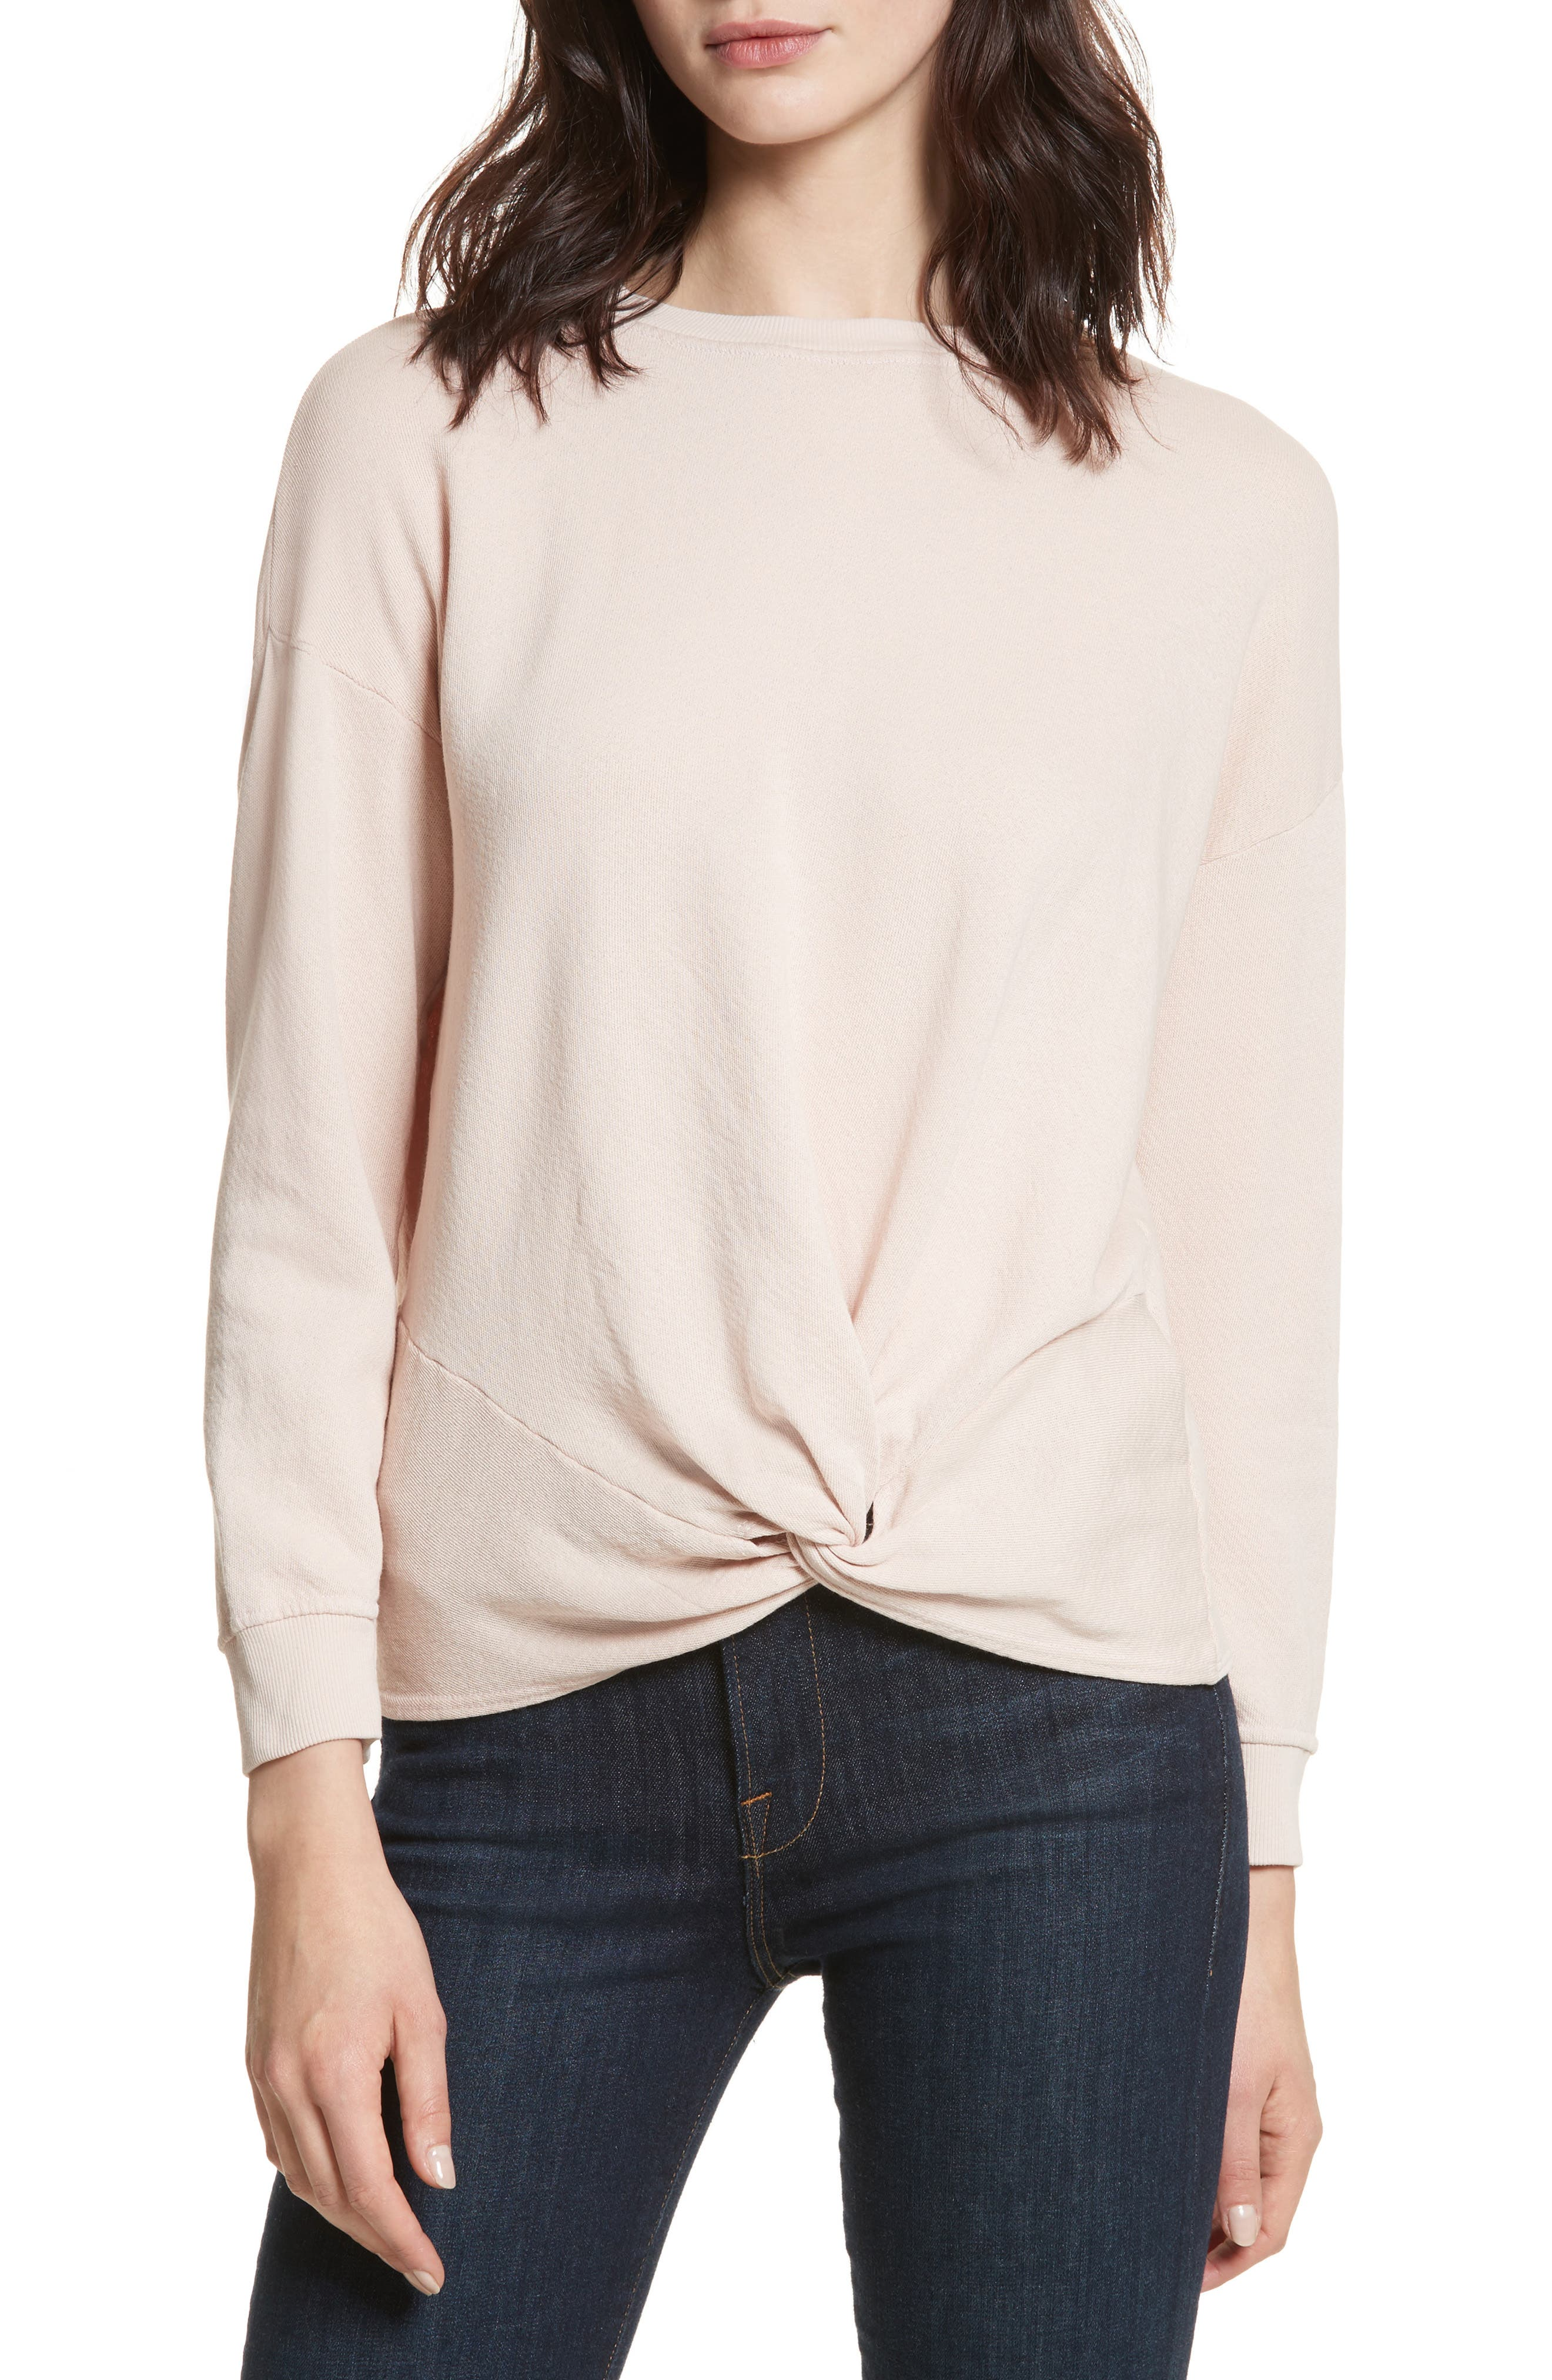 Nazani Twist Front Sweatshirt,                             Main thumbnail 1, color,                             Heather Rose